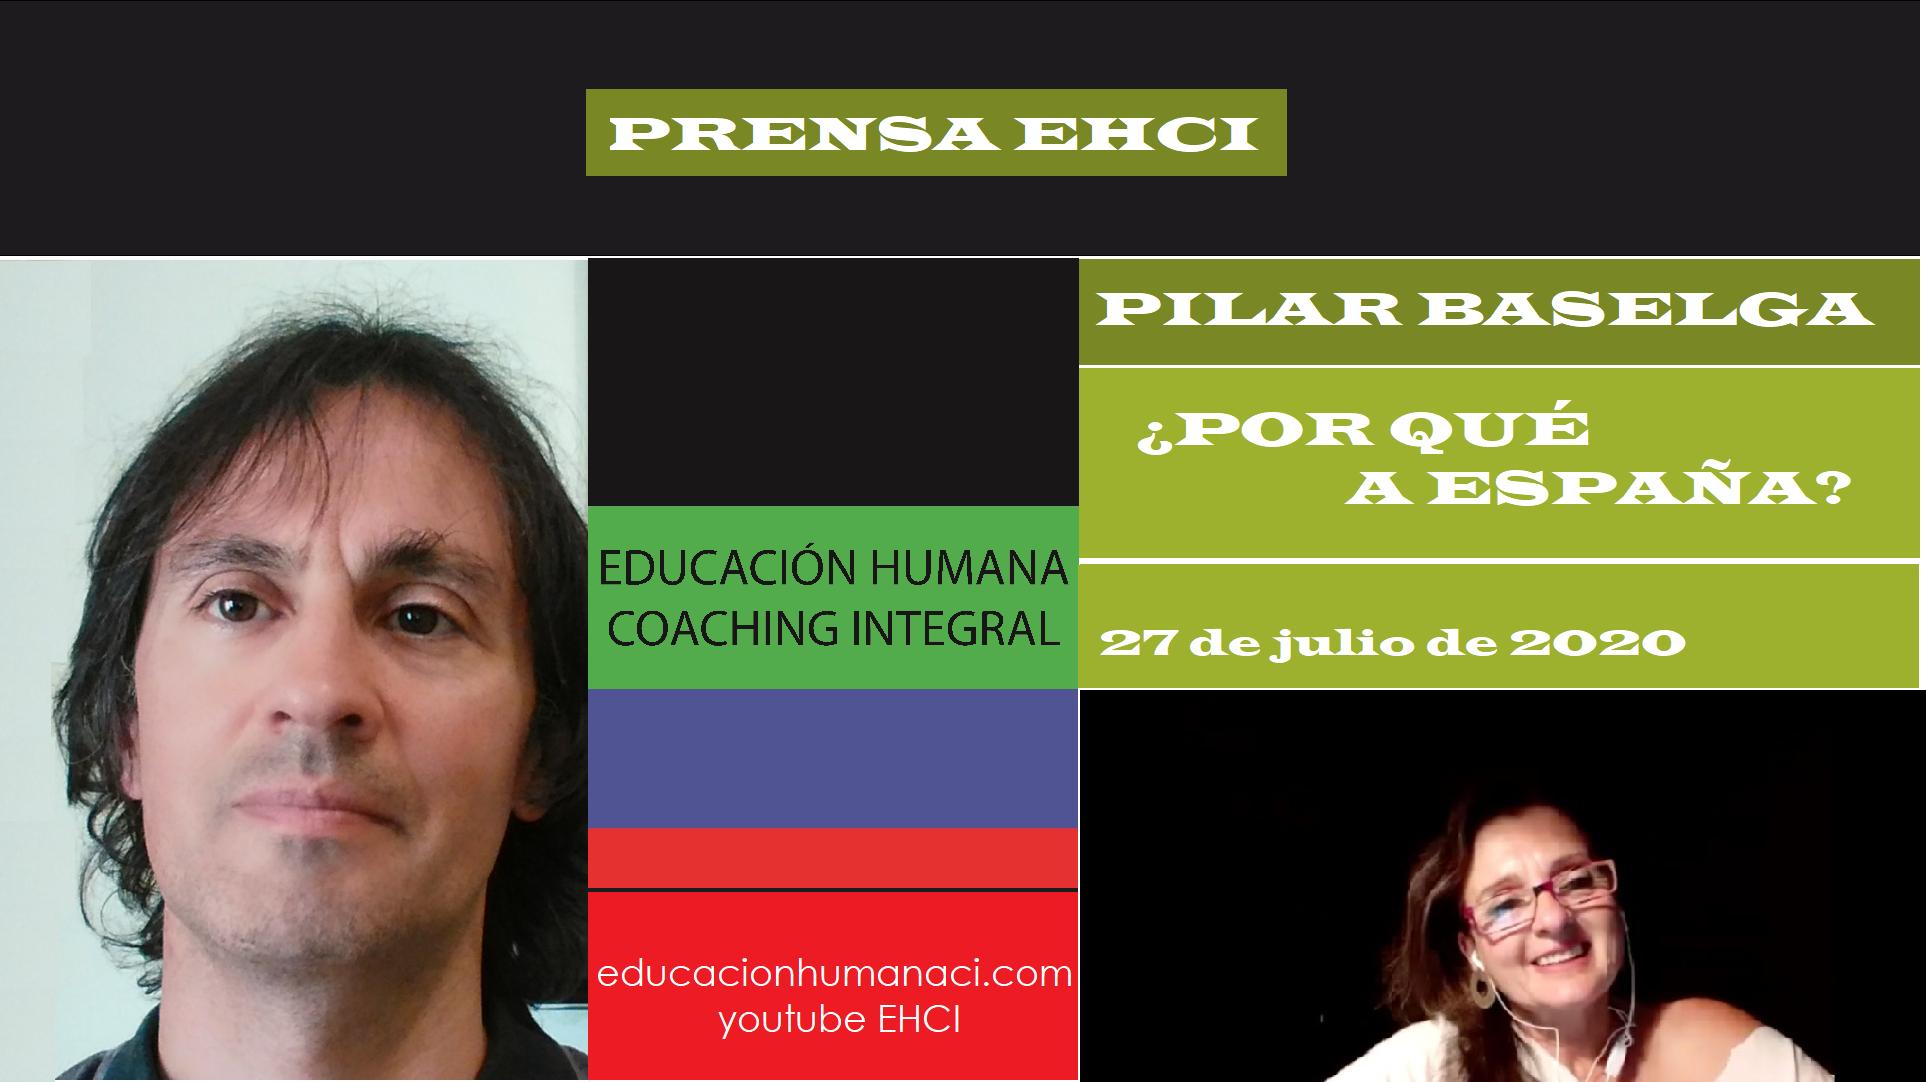 PORTADA EHCI Prensa 2020 - copia 4